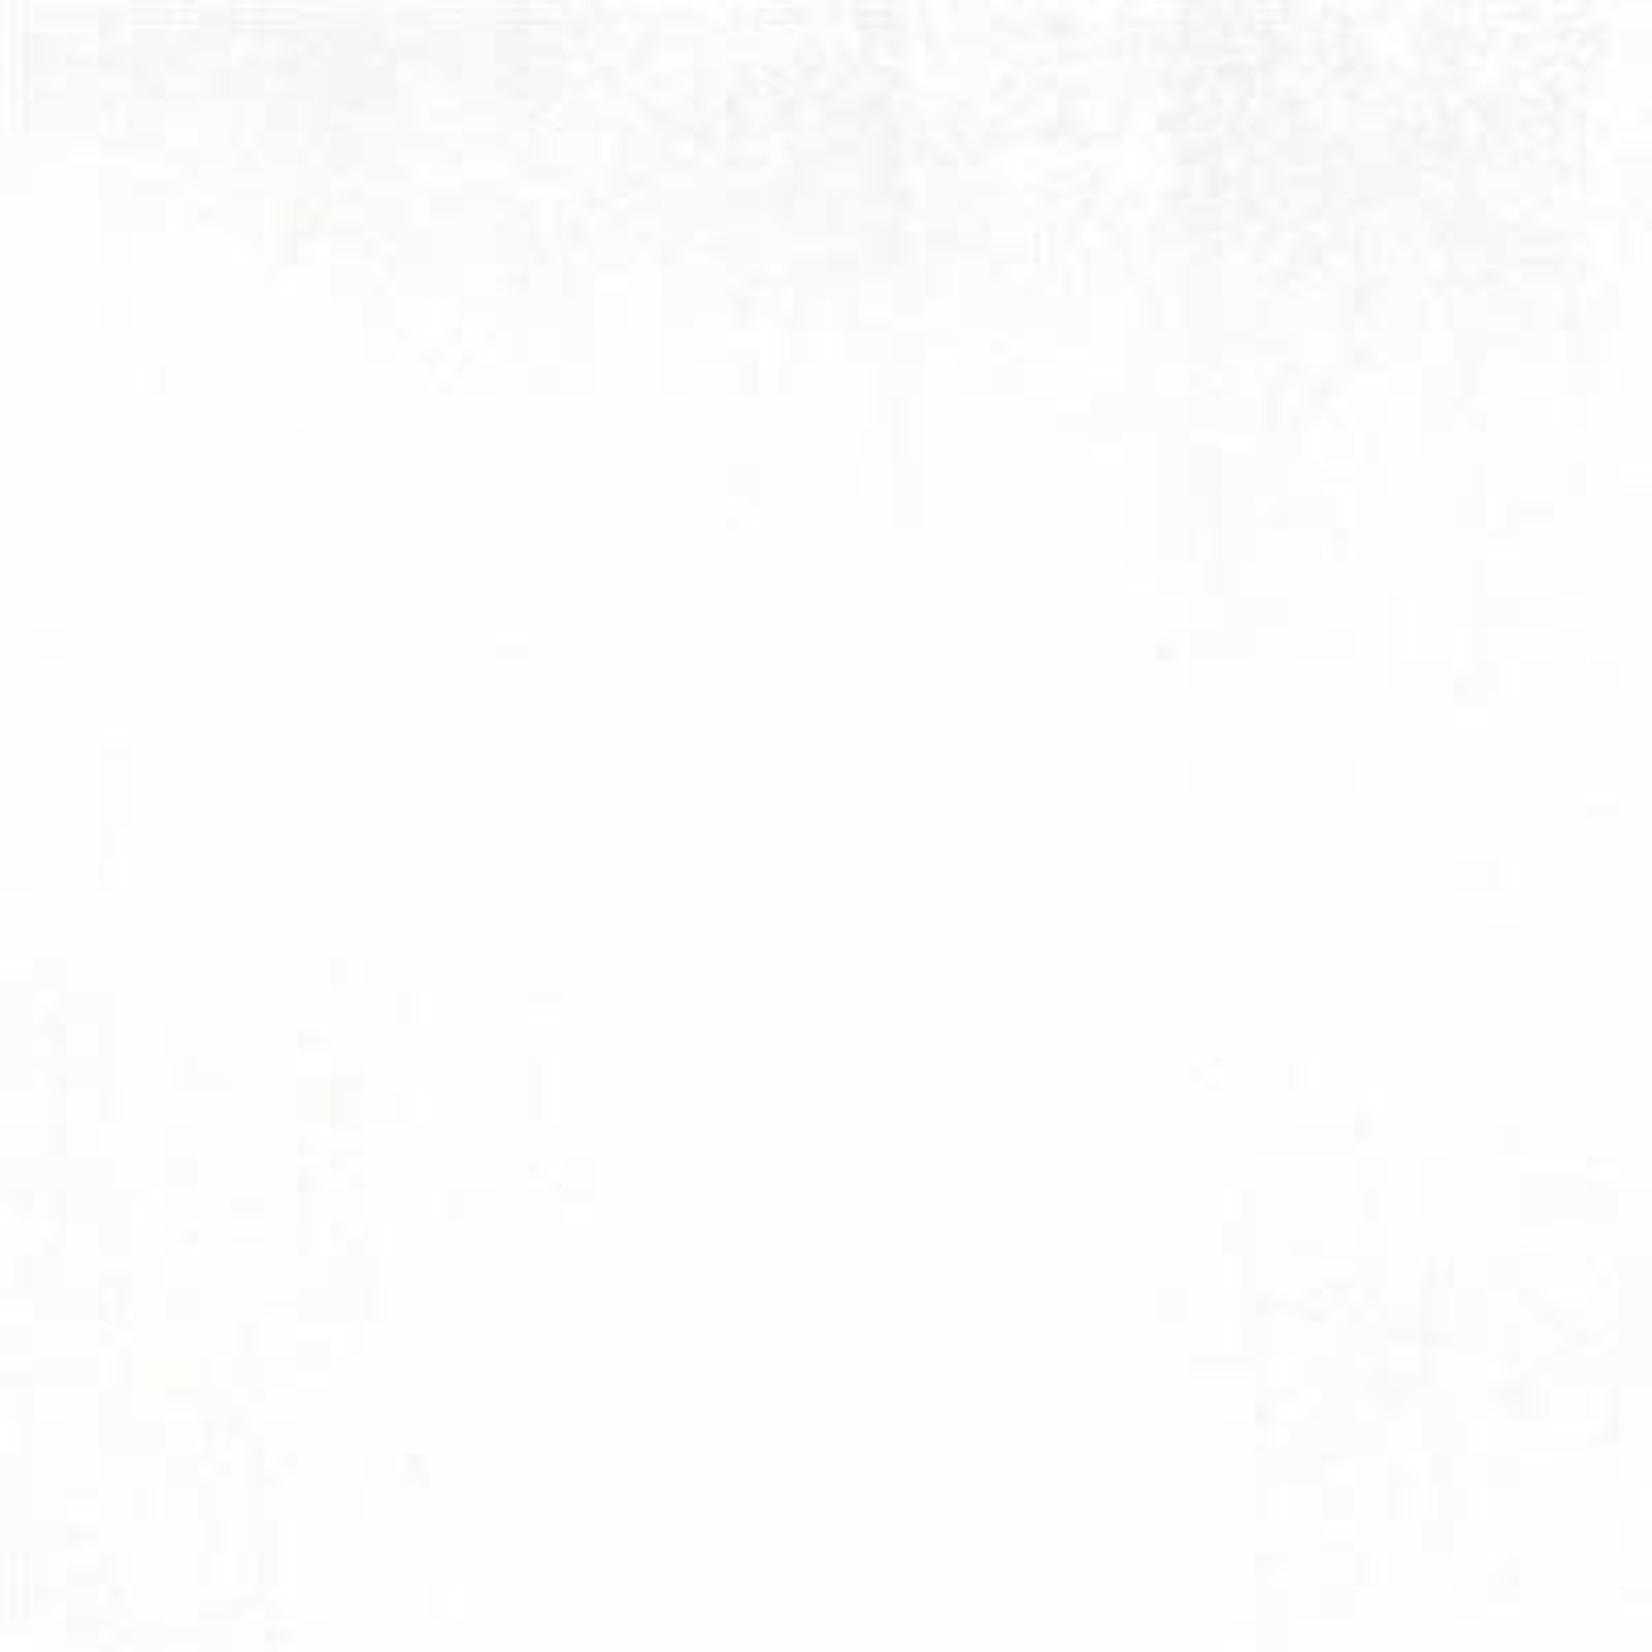 Moda Grunge Basics Grunge - White (101) per cm or $20/m